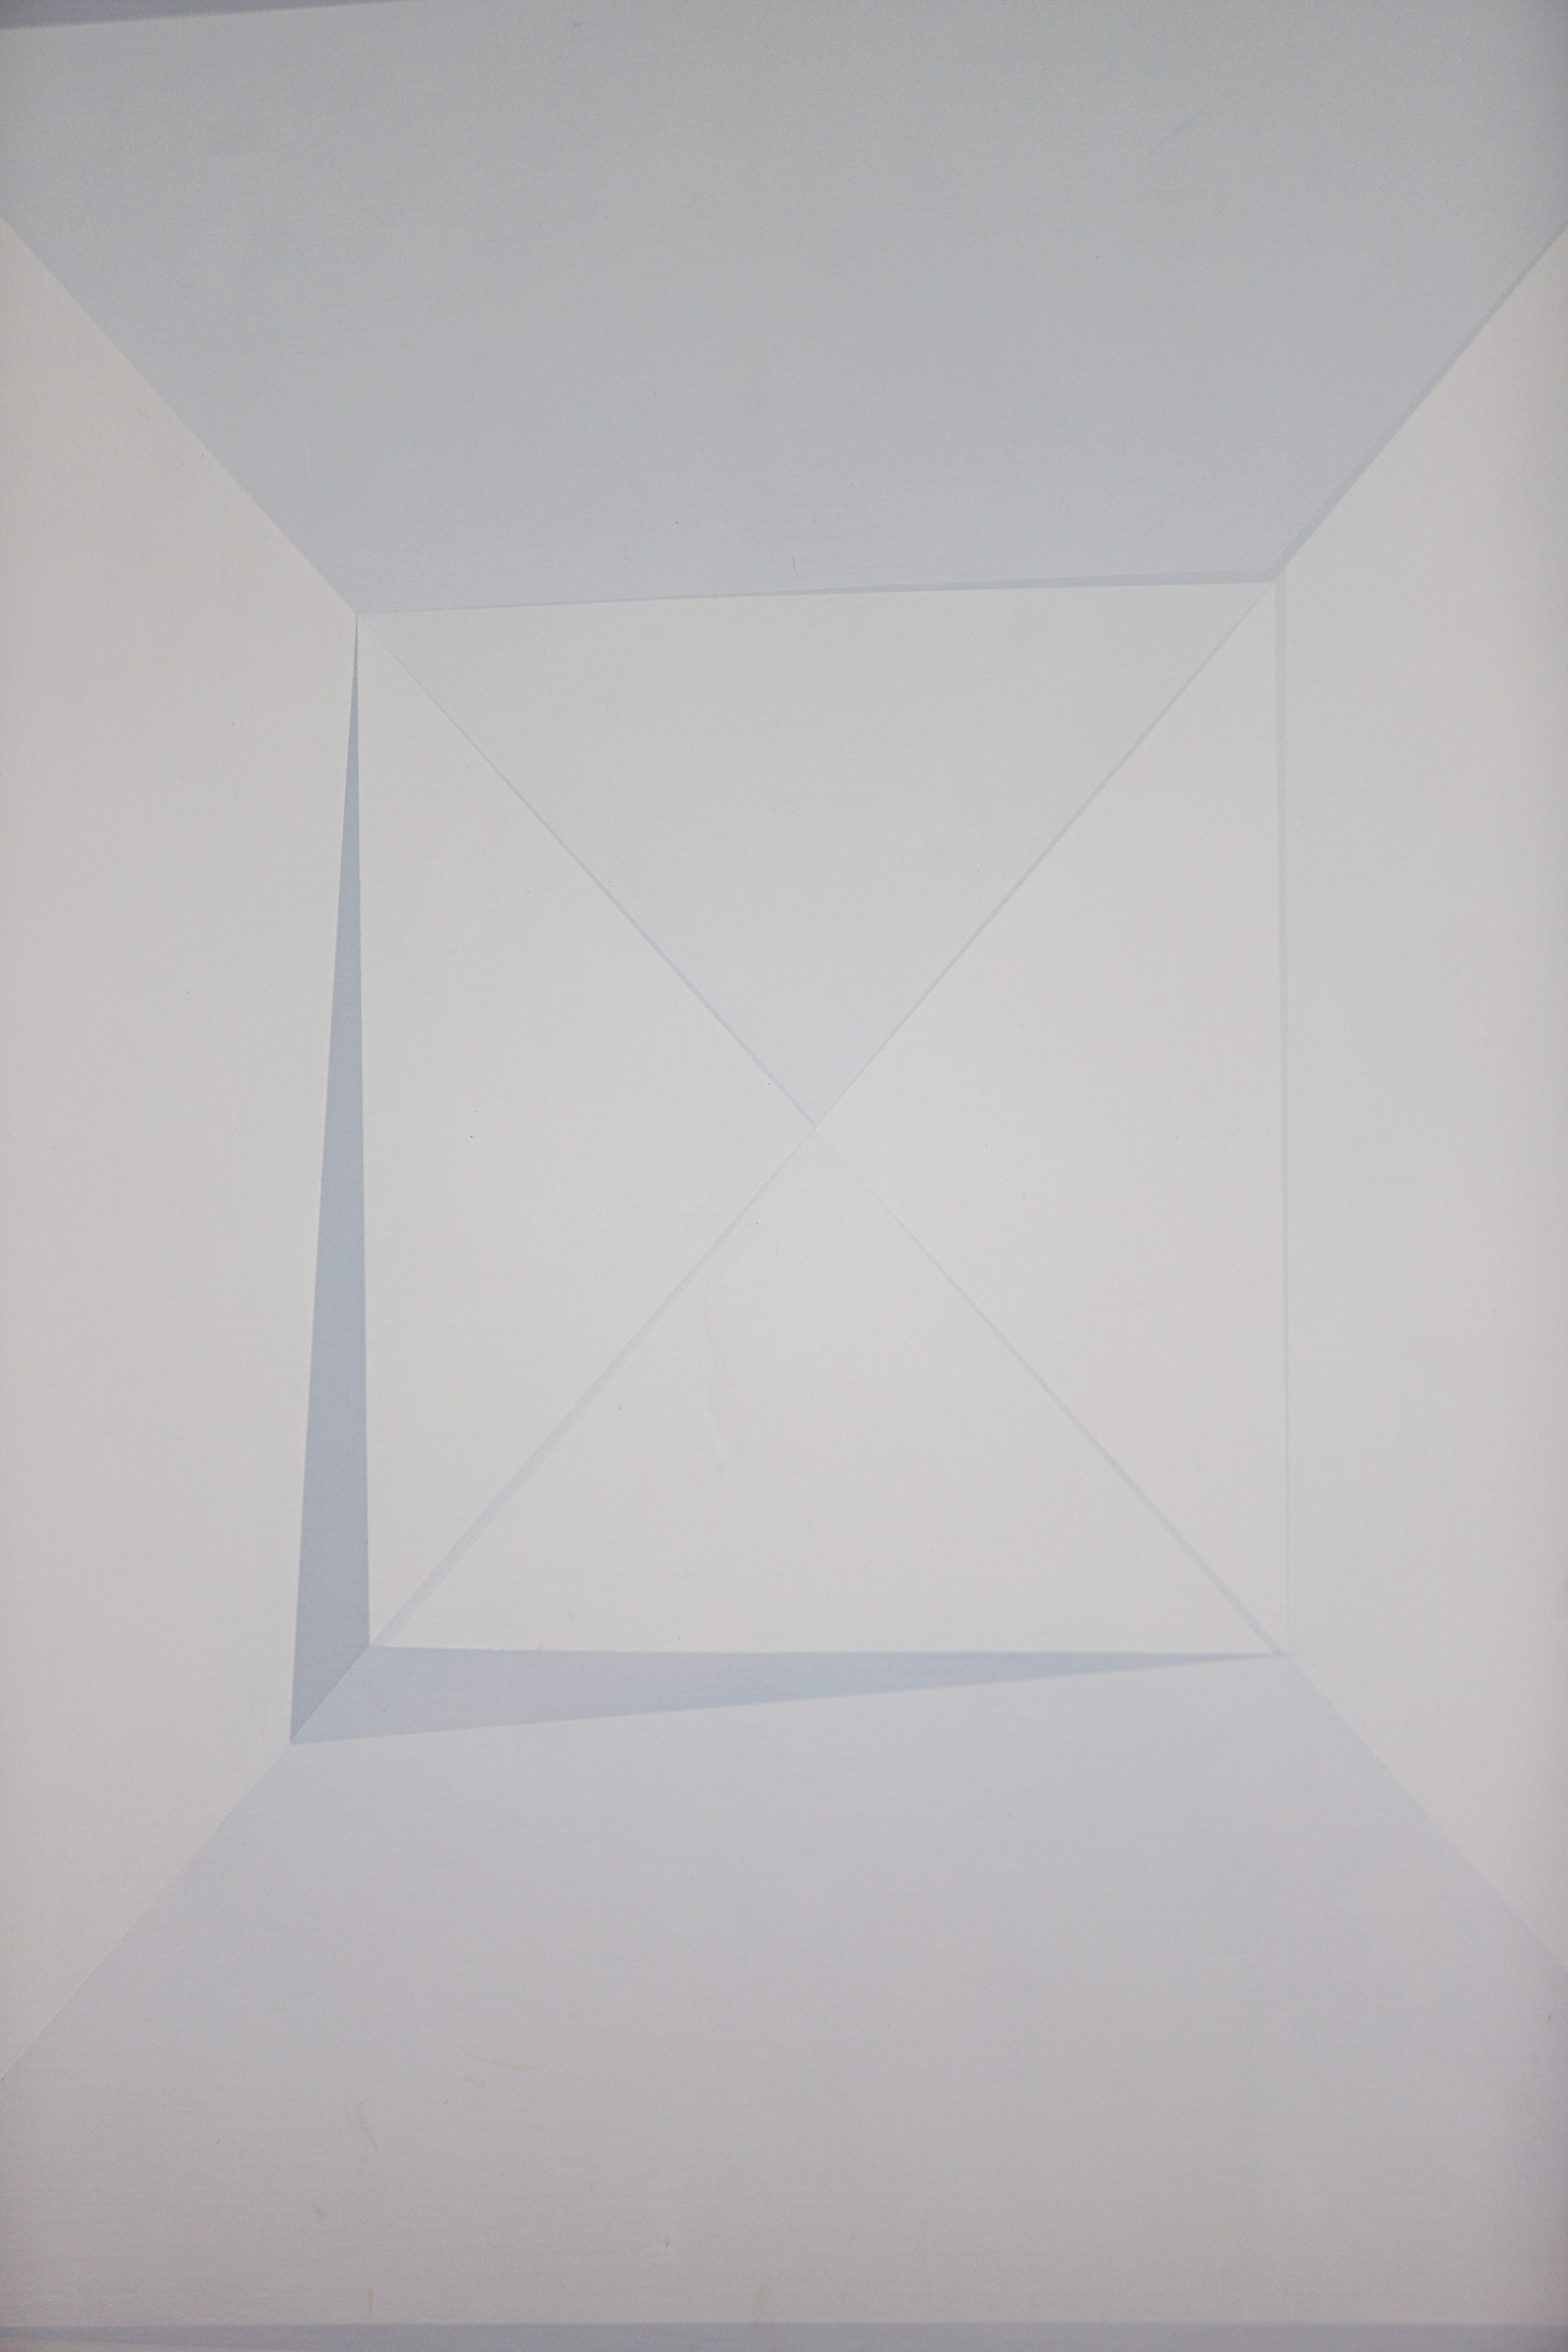 Gilberth Swinberghe Art Work 1977image 4